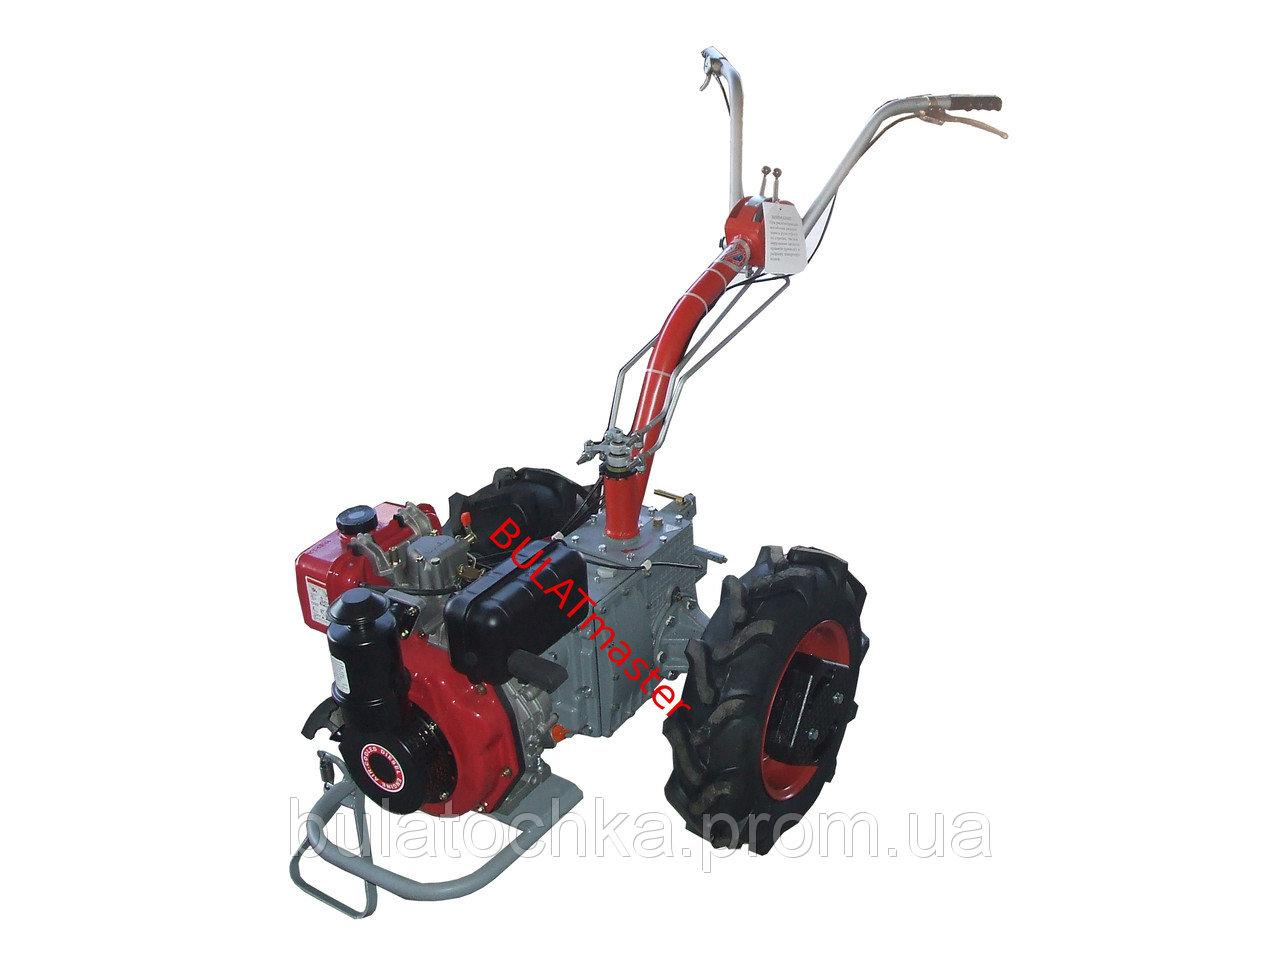 Мотоблок дизельний Мотор Січ МБ-6Д